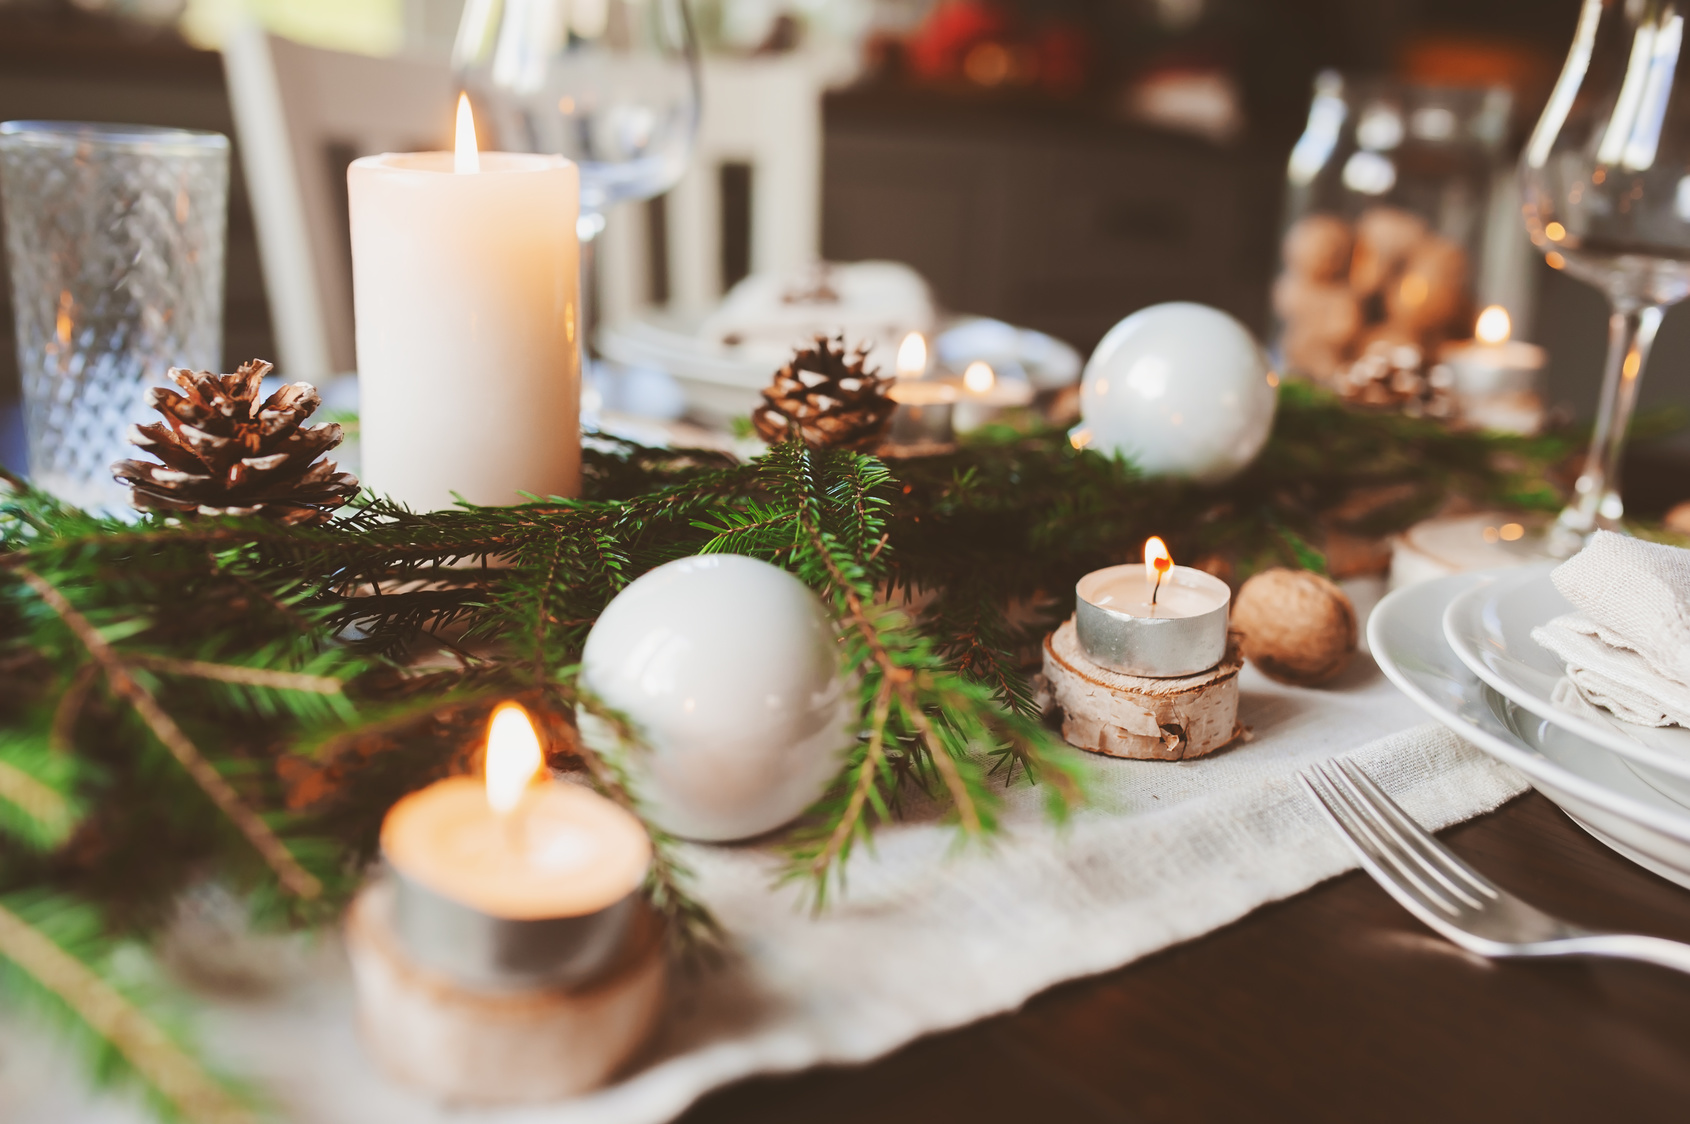 5 Common mistakes to avoid this Christmas - Christmas table - Sash Smart